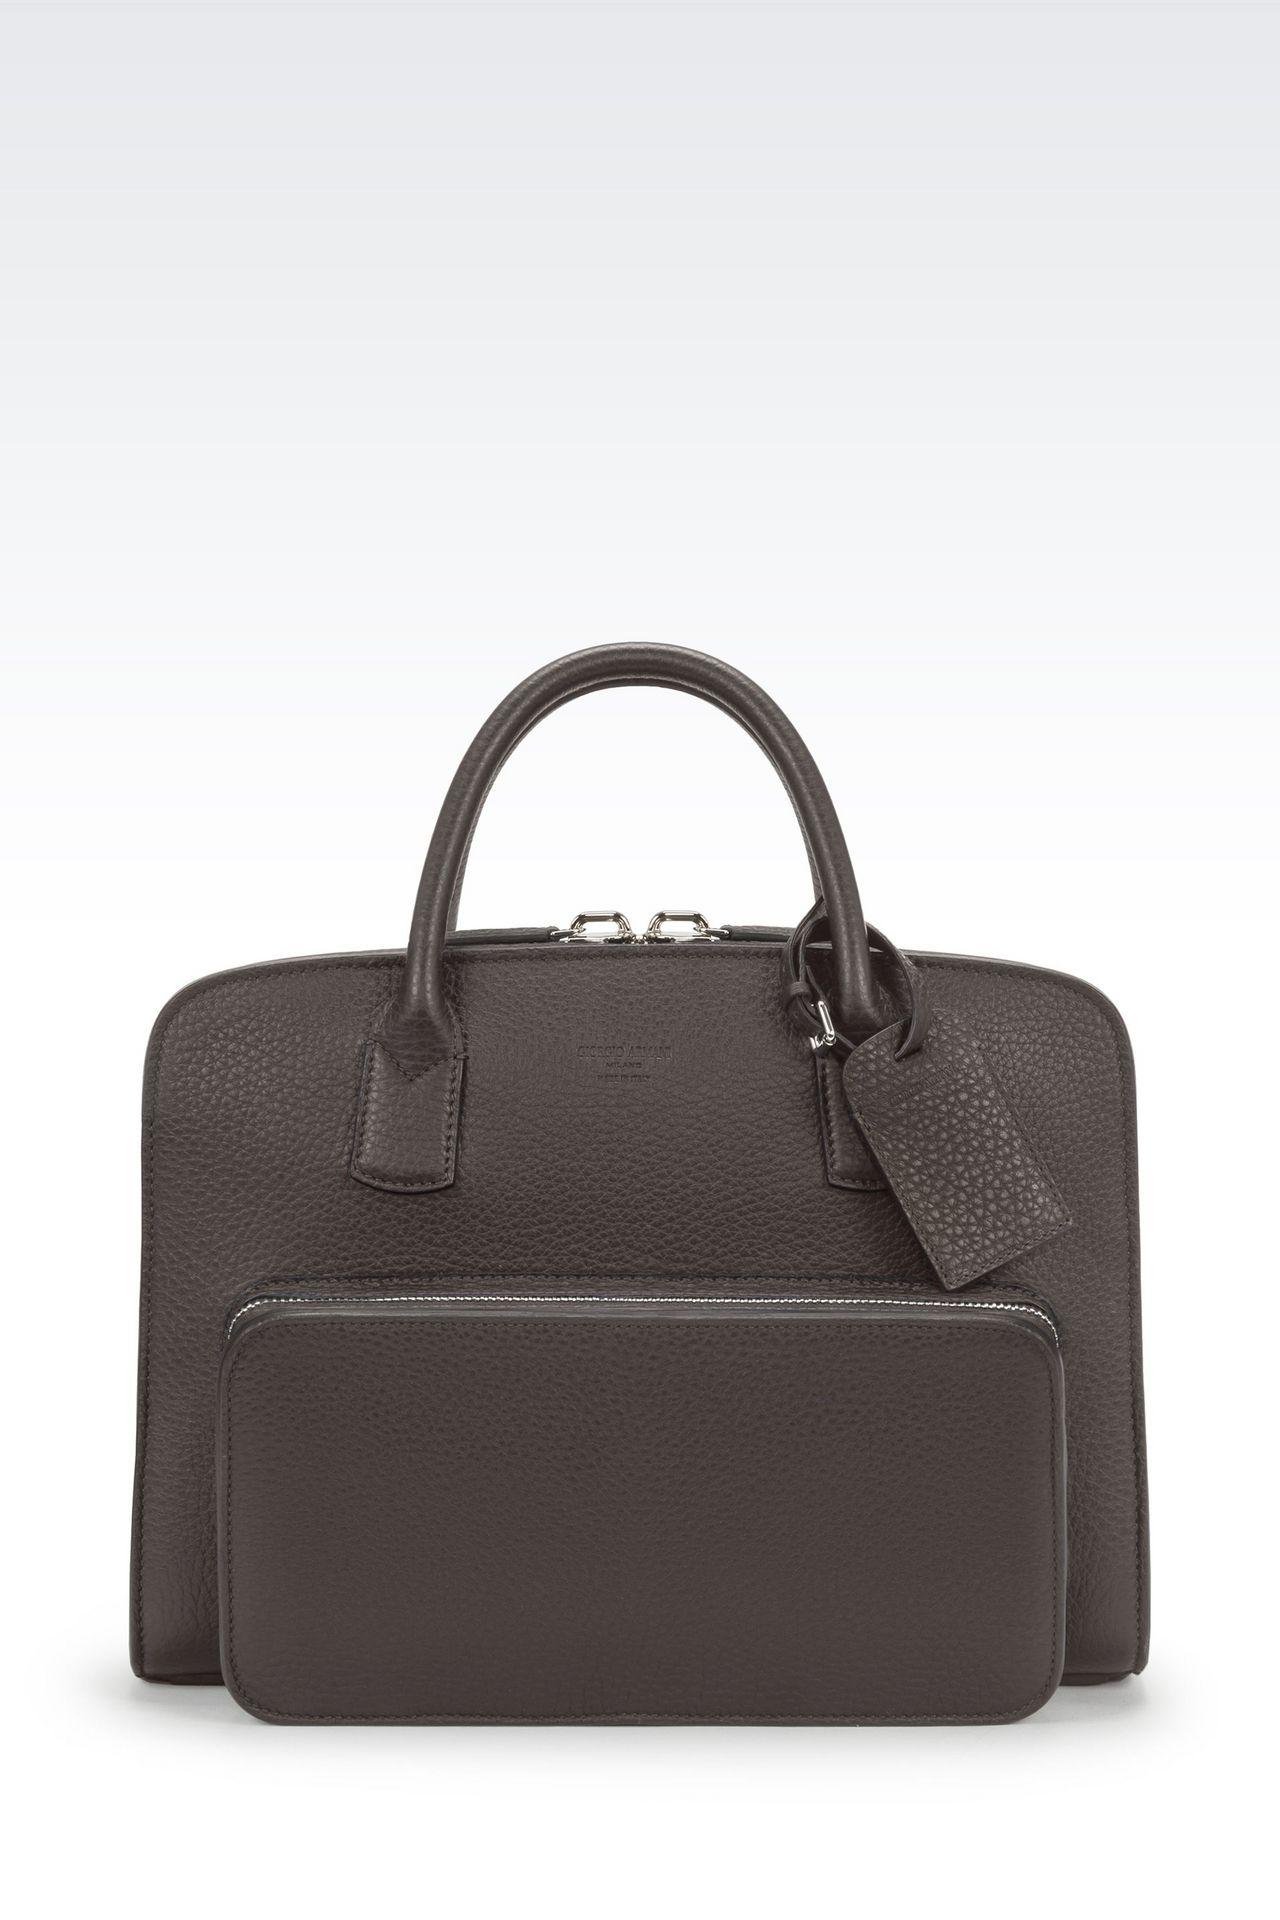 Giorgio Armani Men's Bags - Spring Summer 2017 - Armani.com